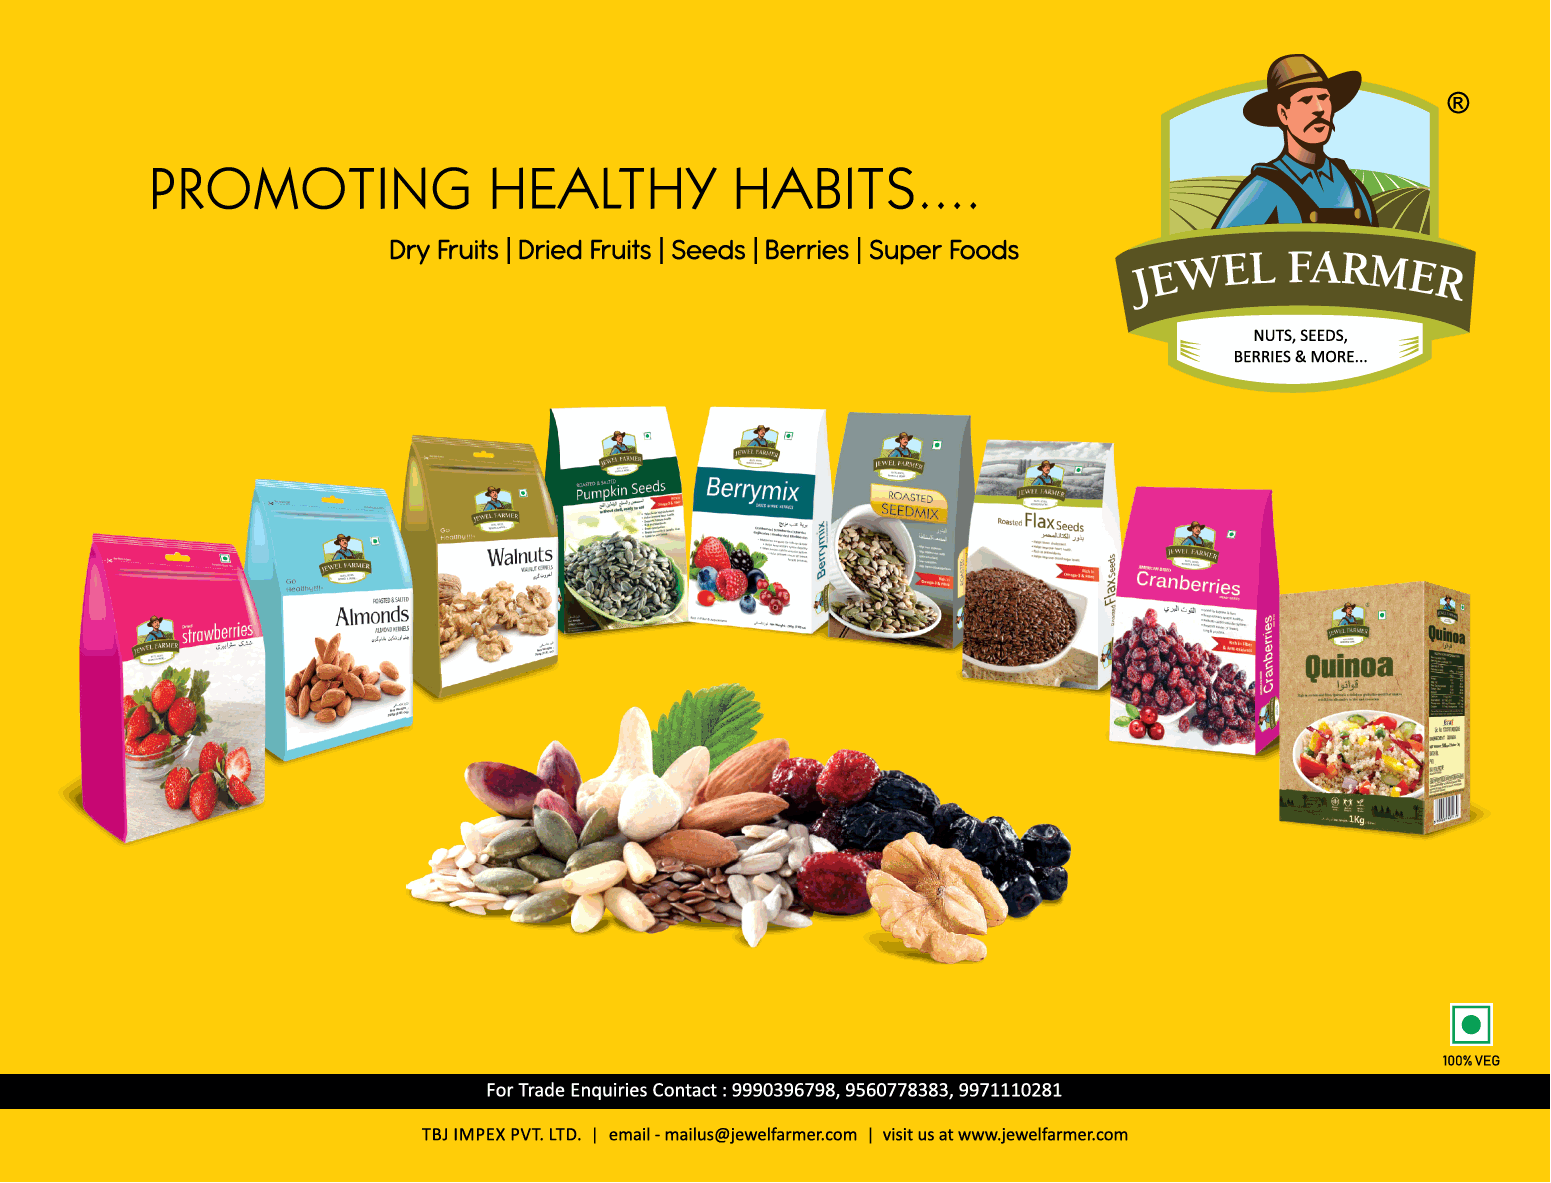 Jewel Farmer Promoting Healthy Habits Ad